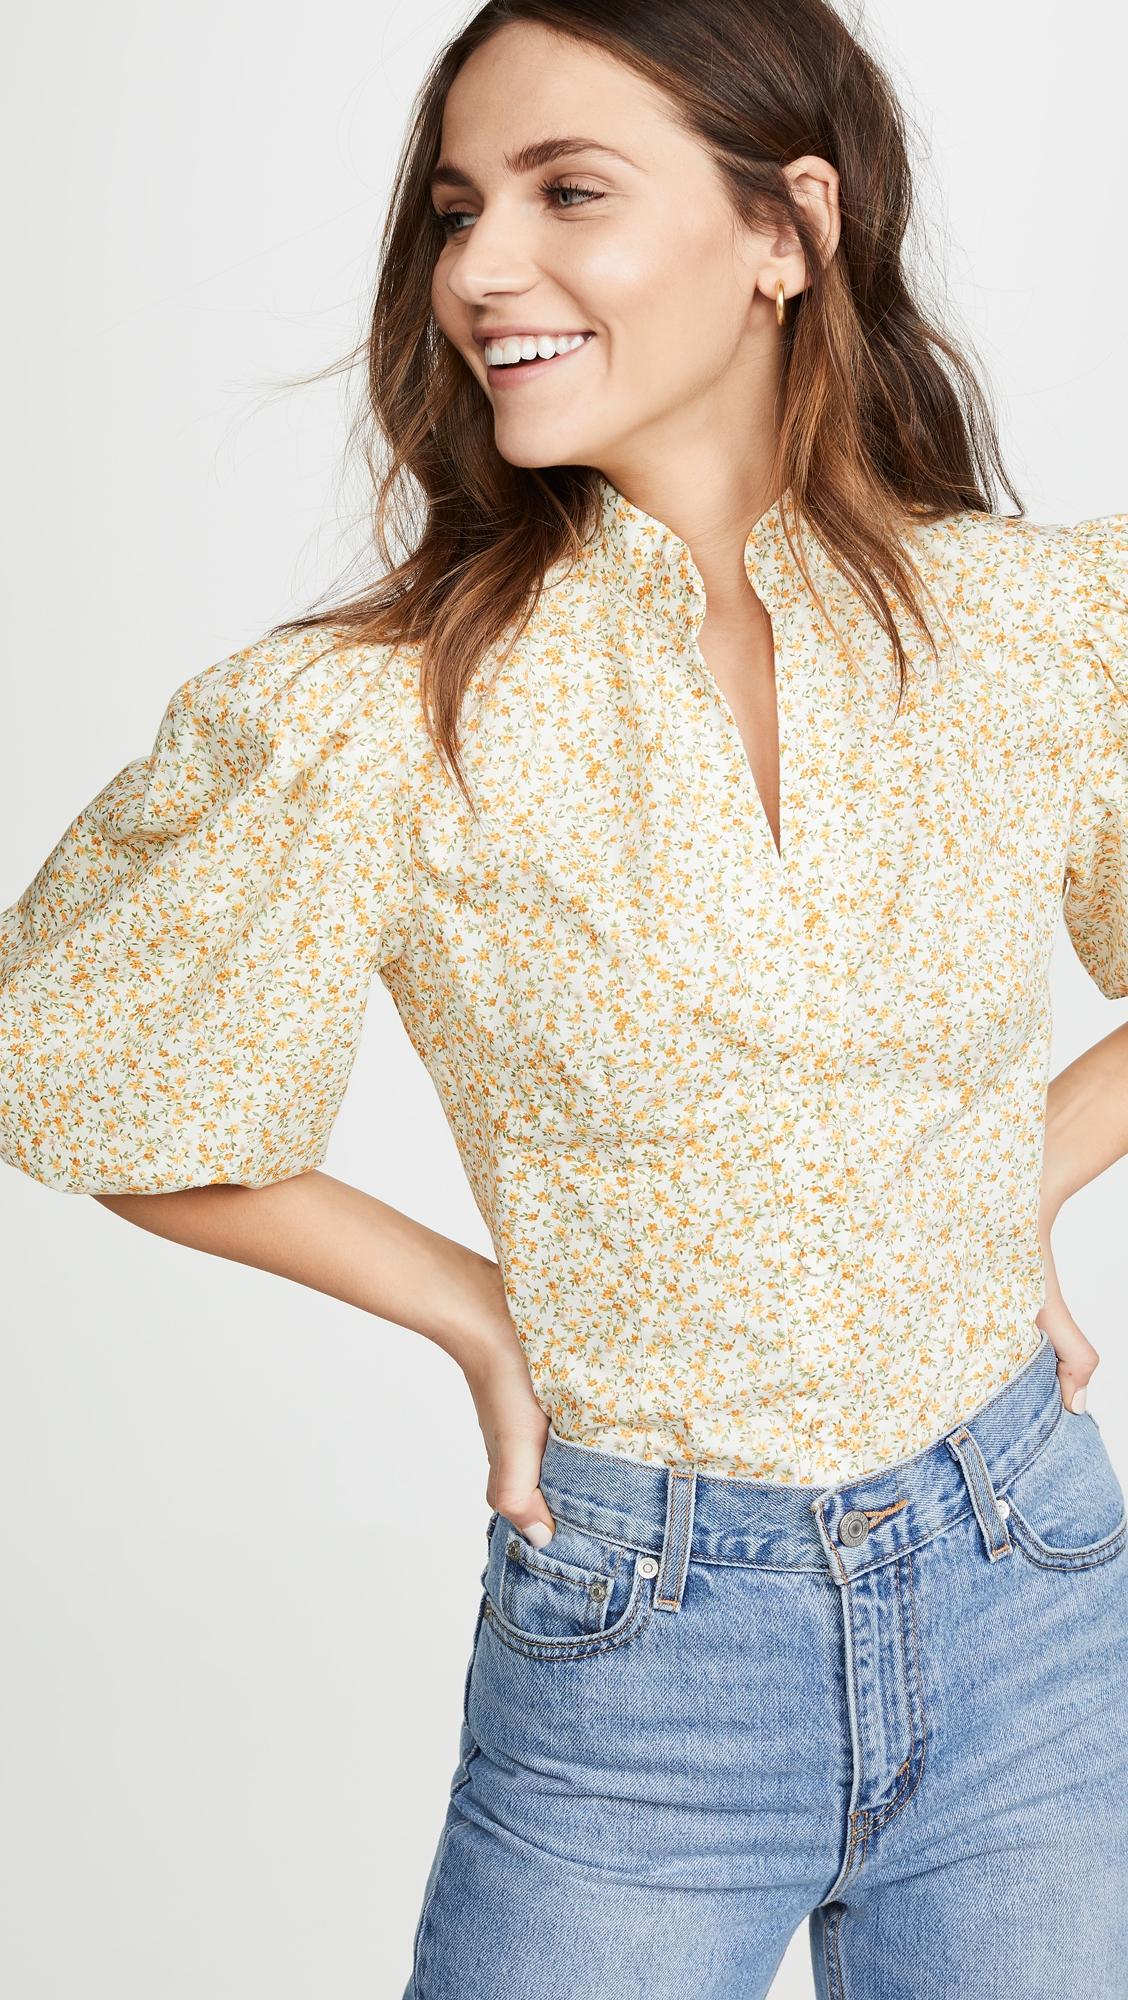 Capri Top Fashion Tops Suits For Women